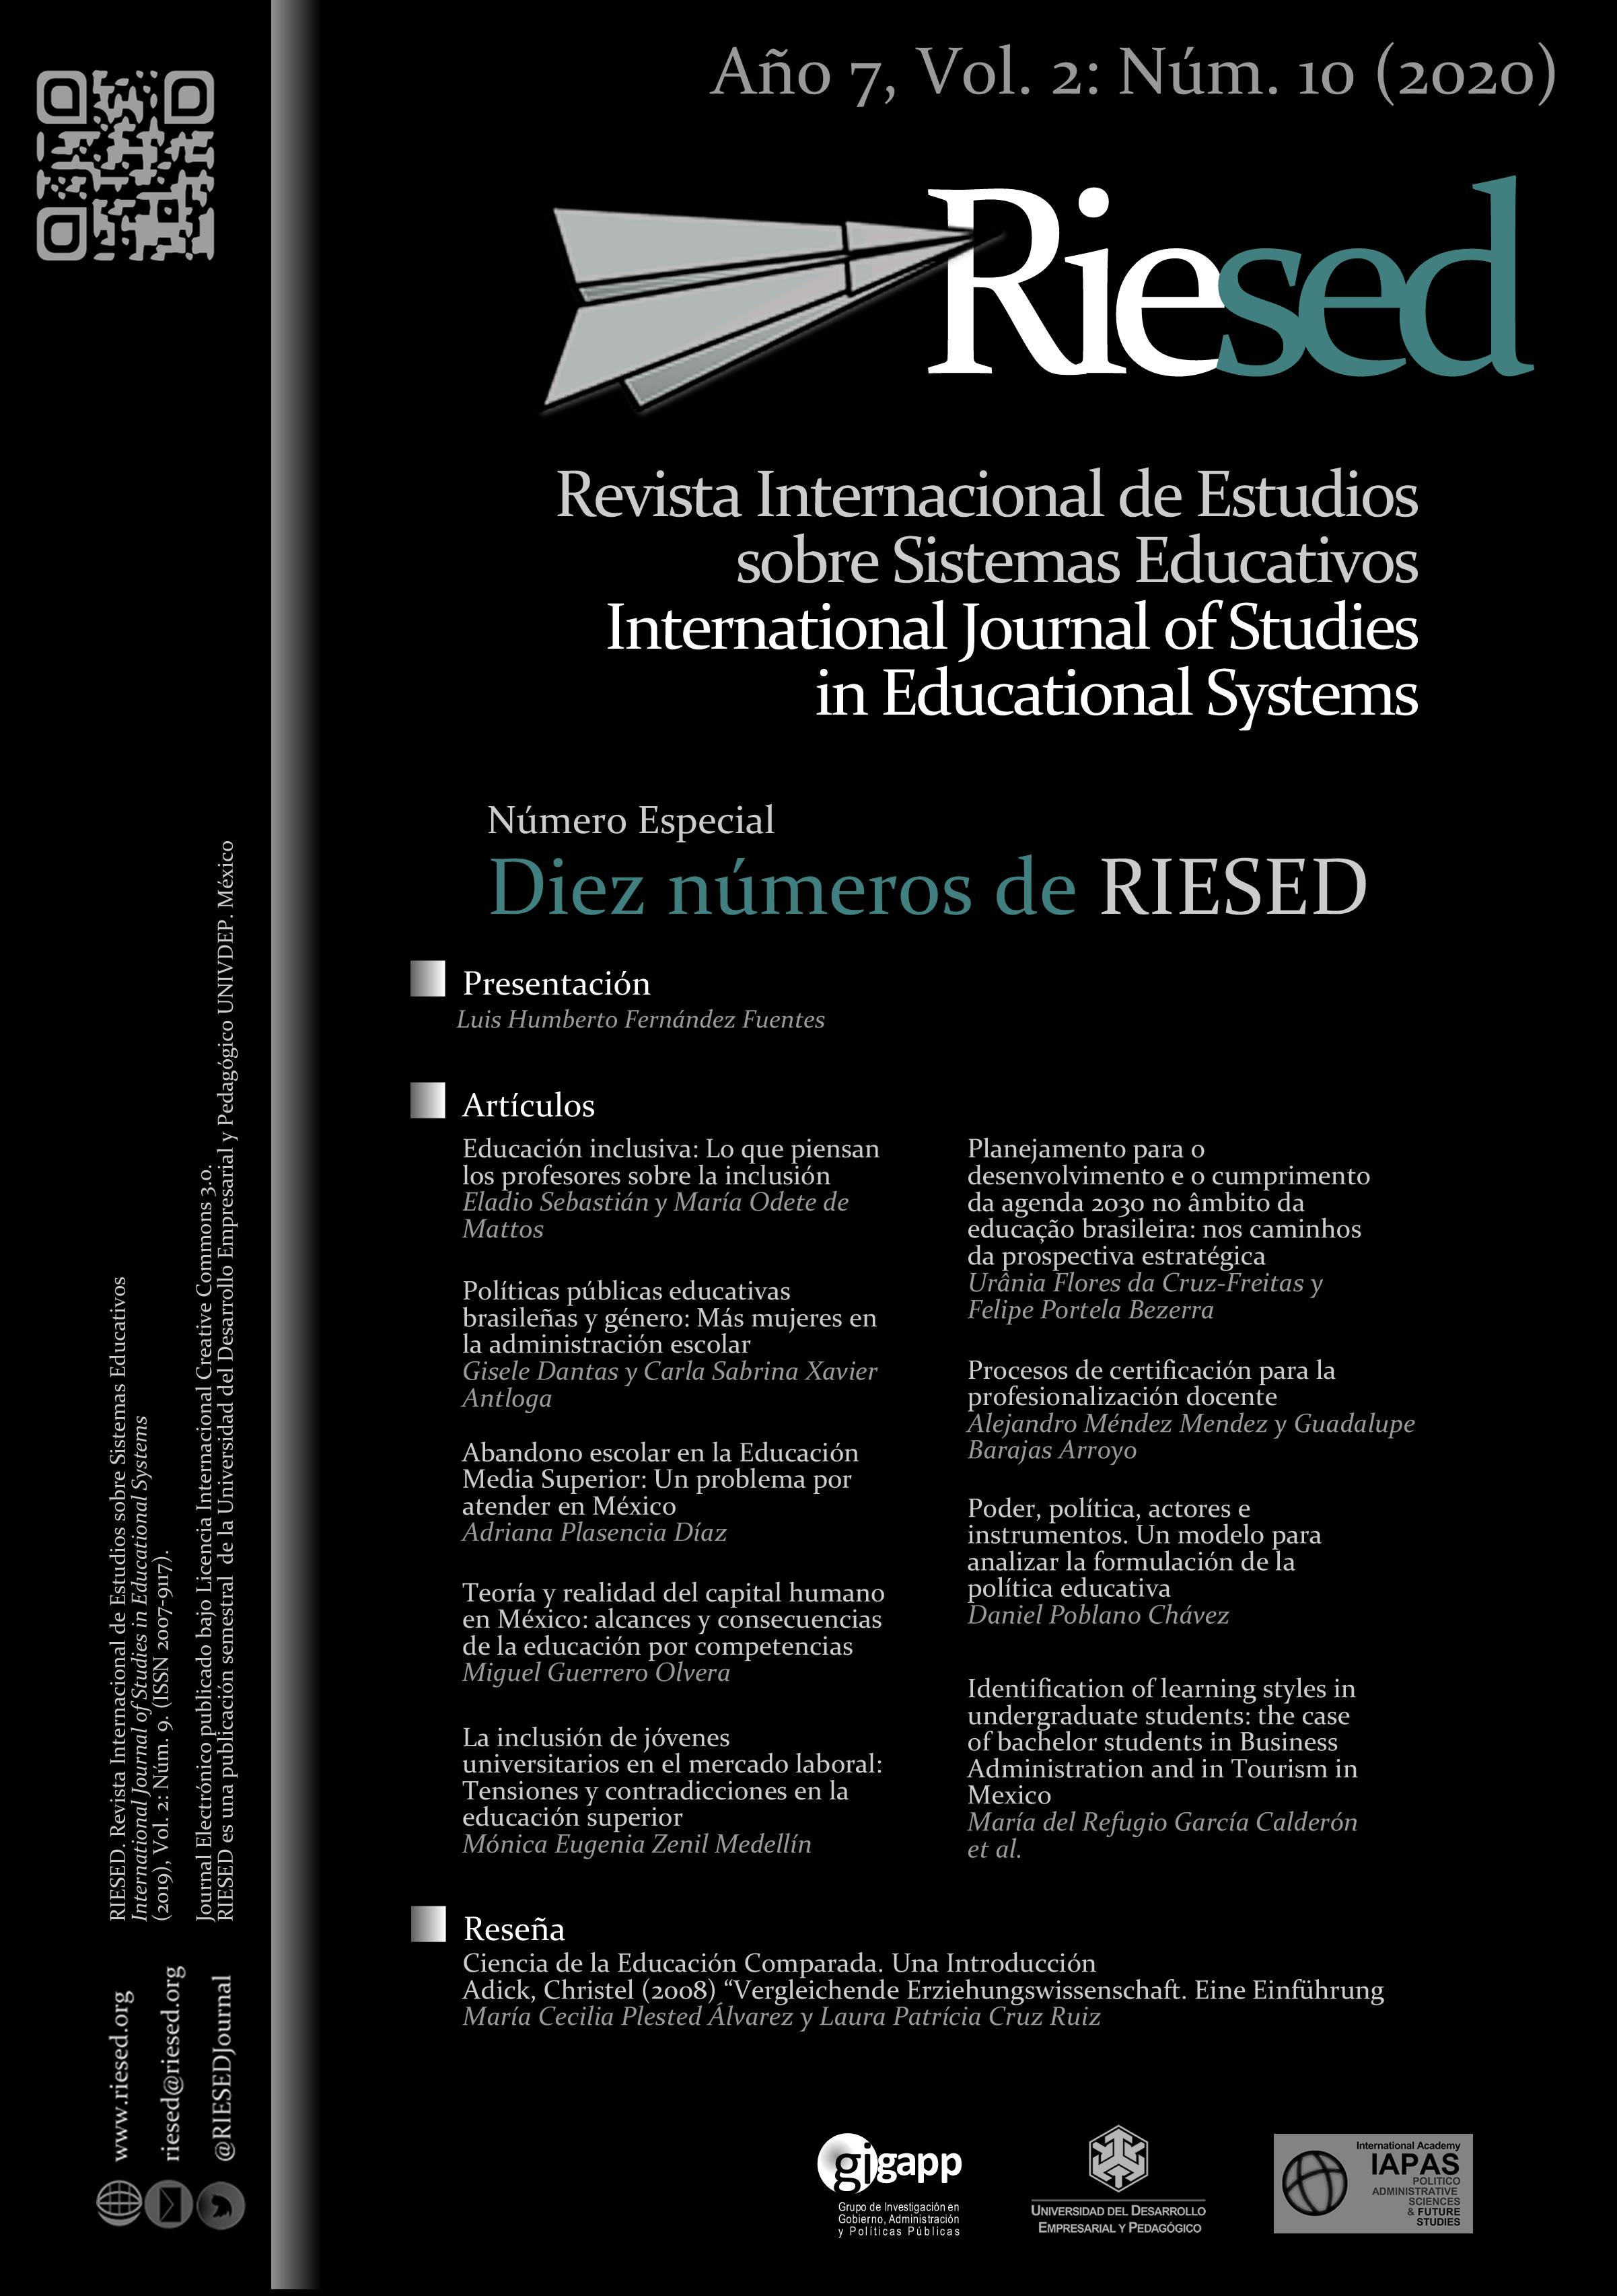 RIESED-10-2020-portada